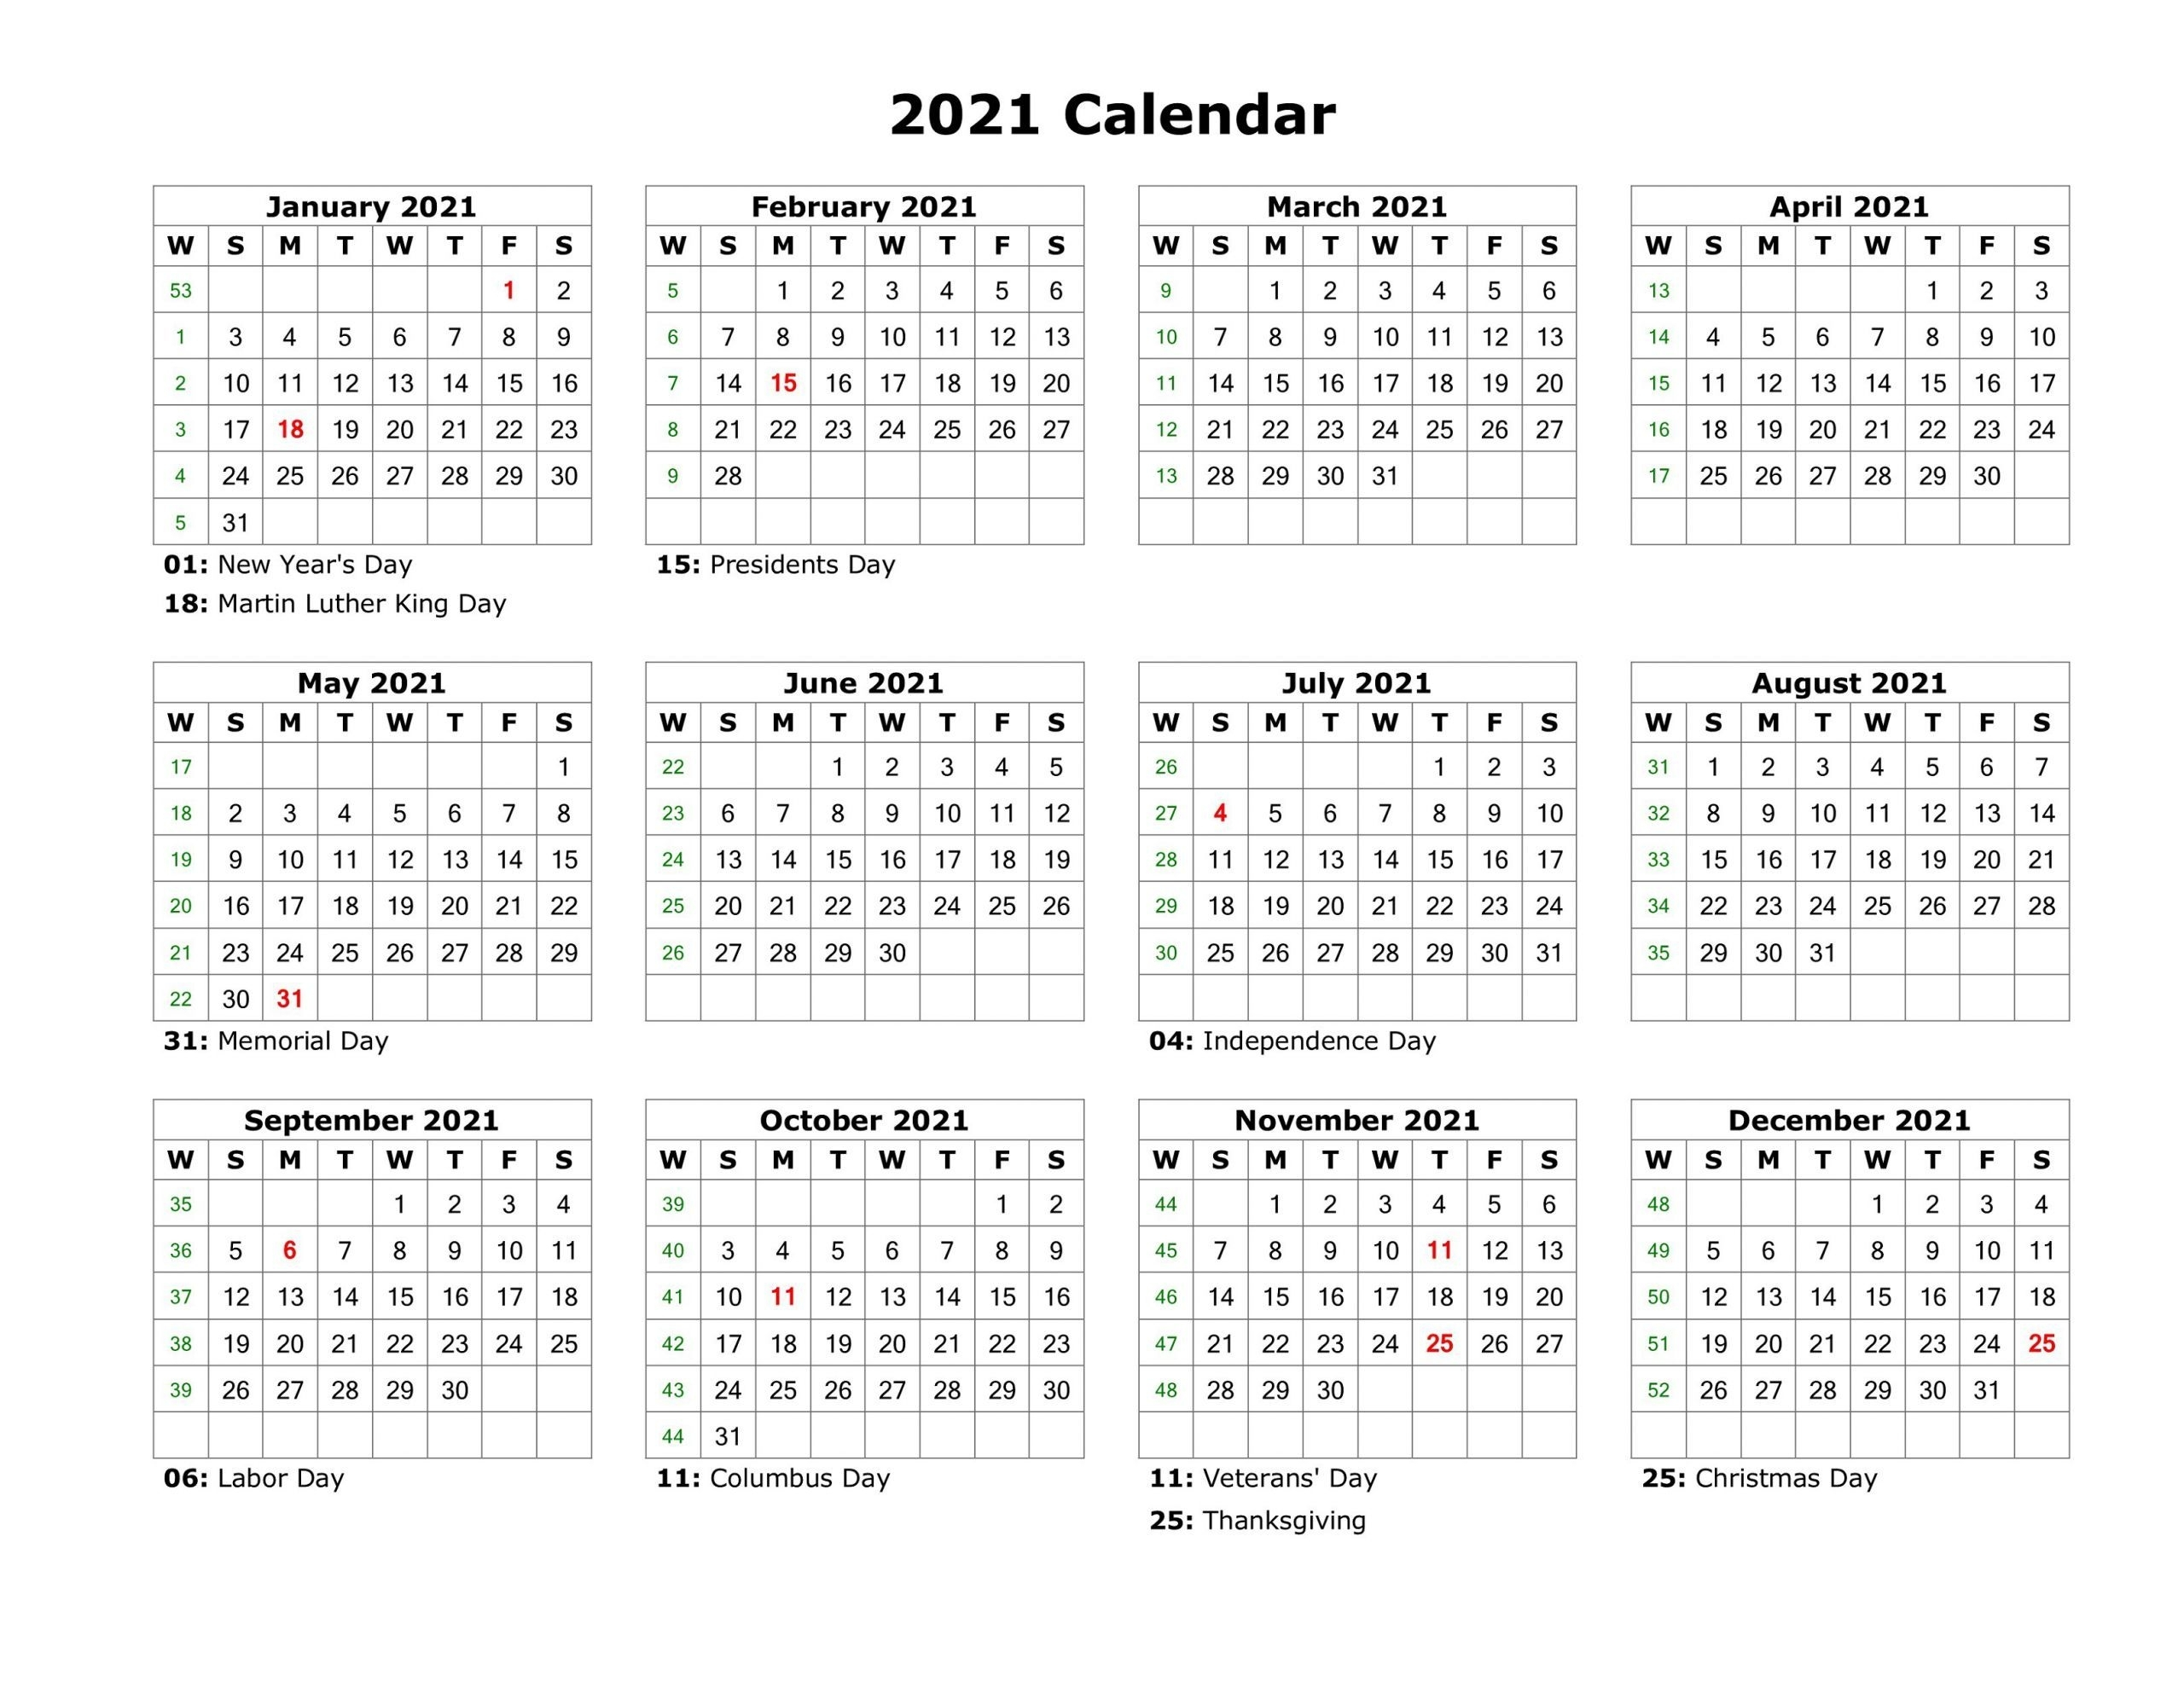 Collect Calendar At A Glance 2021